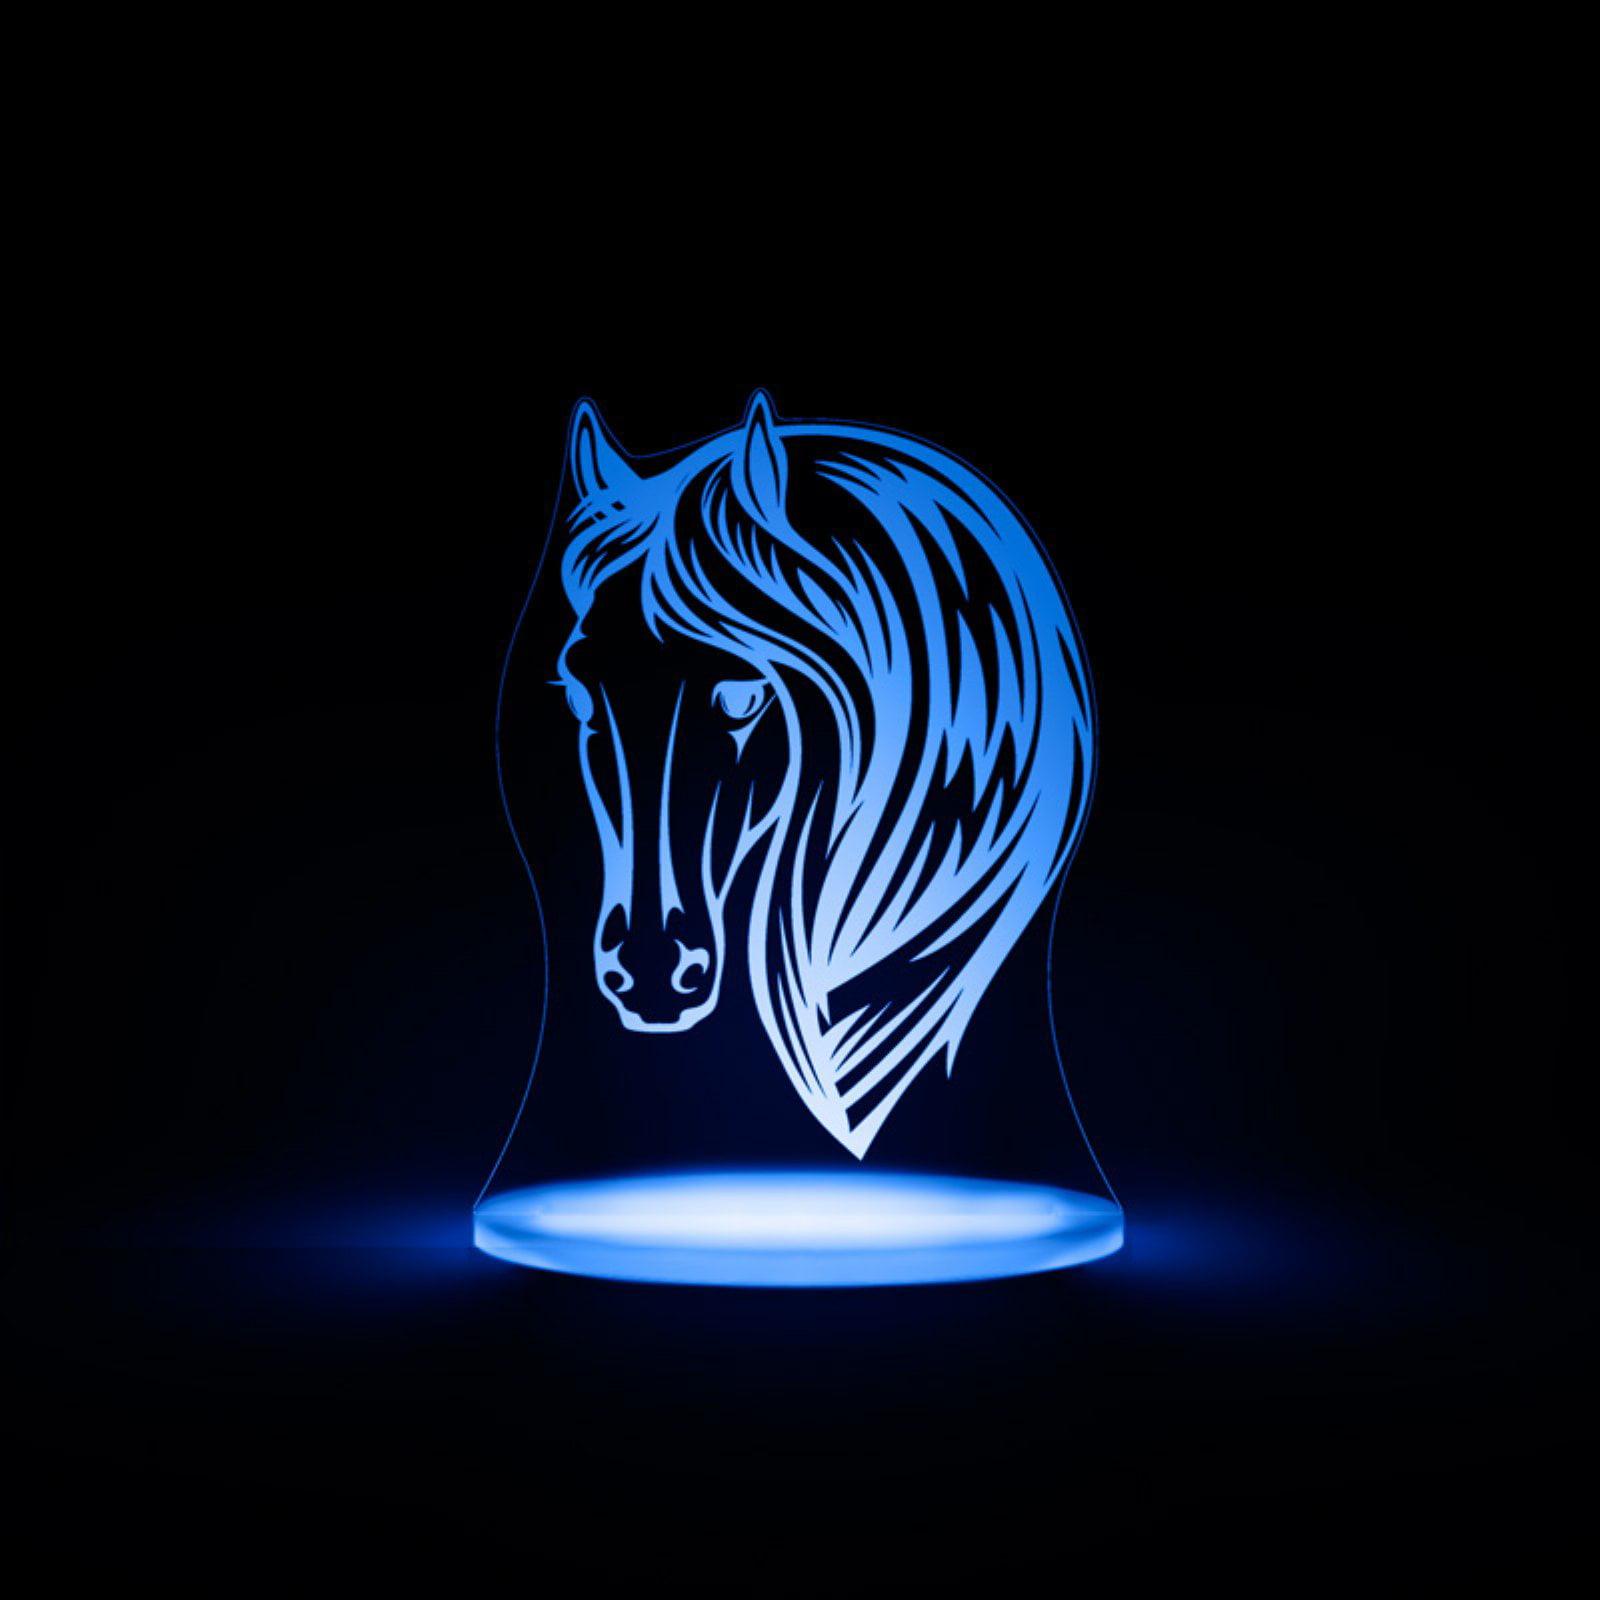 Total Dreamz Horse Multicolored LED Night Light